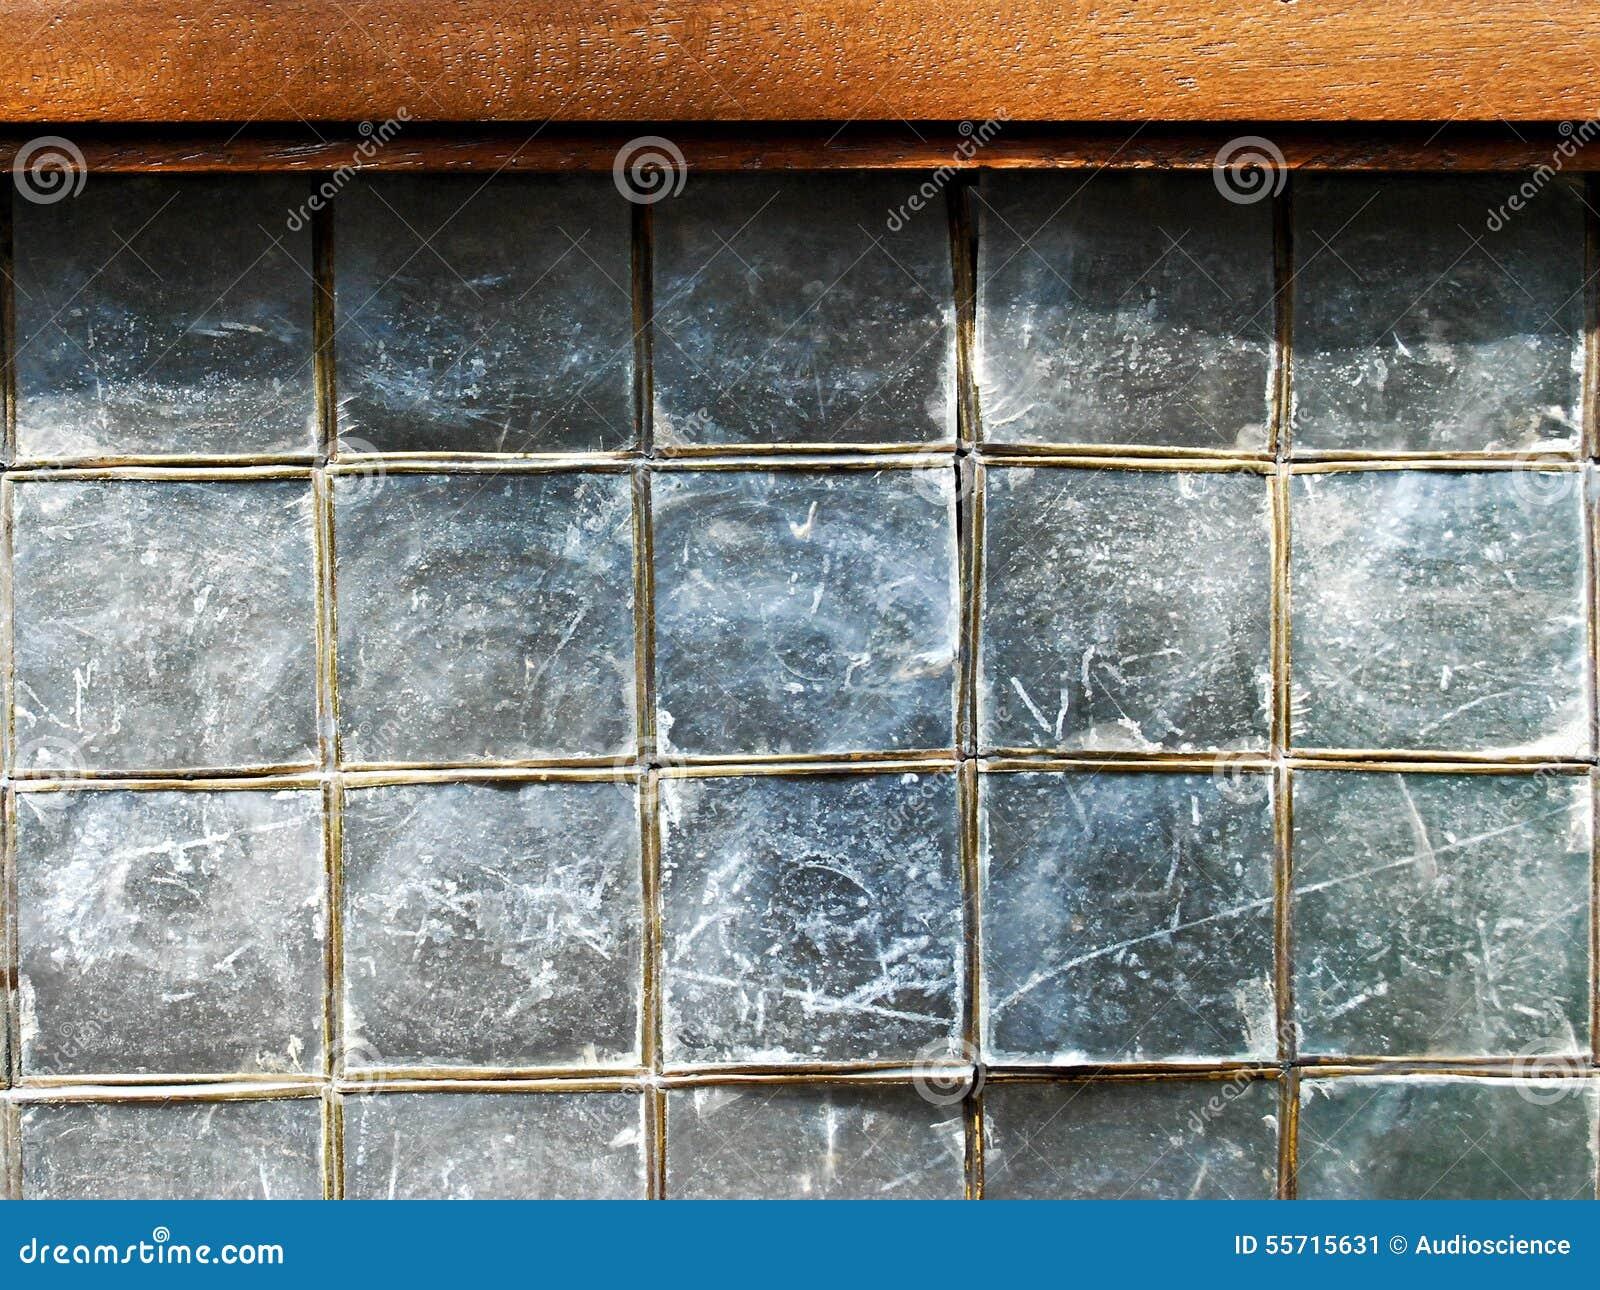 Capiz mother of pearl window surface detail stock photo for Capiz window